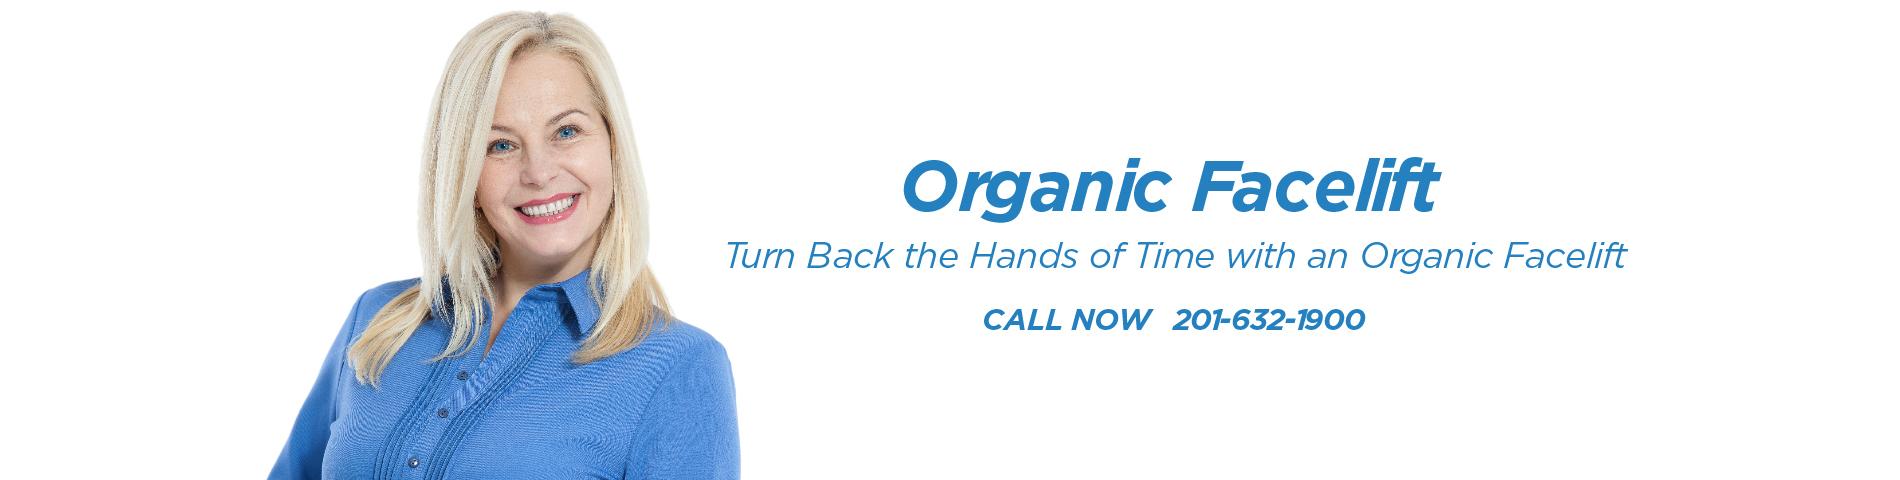 Organic Facelift